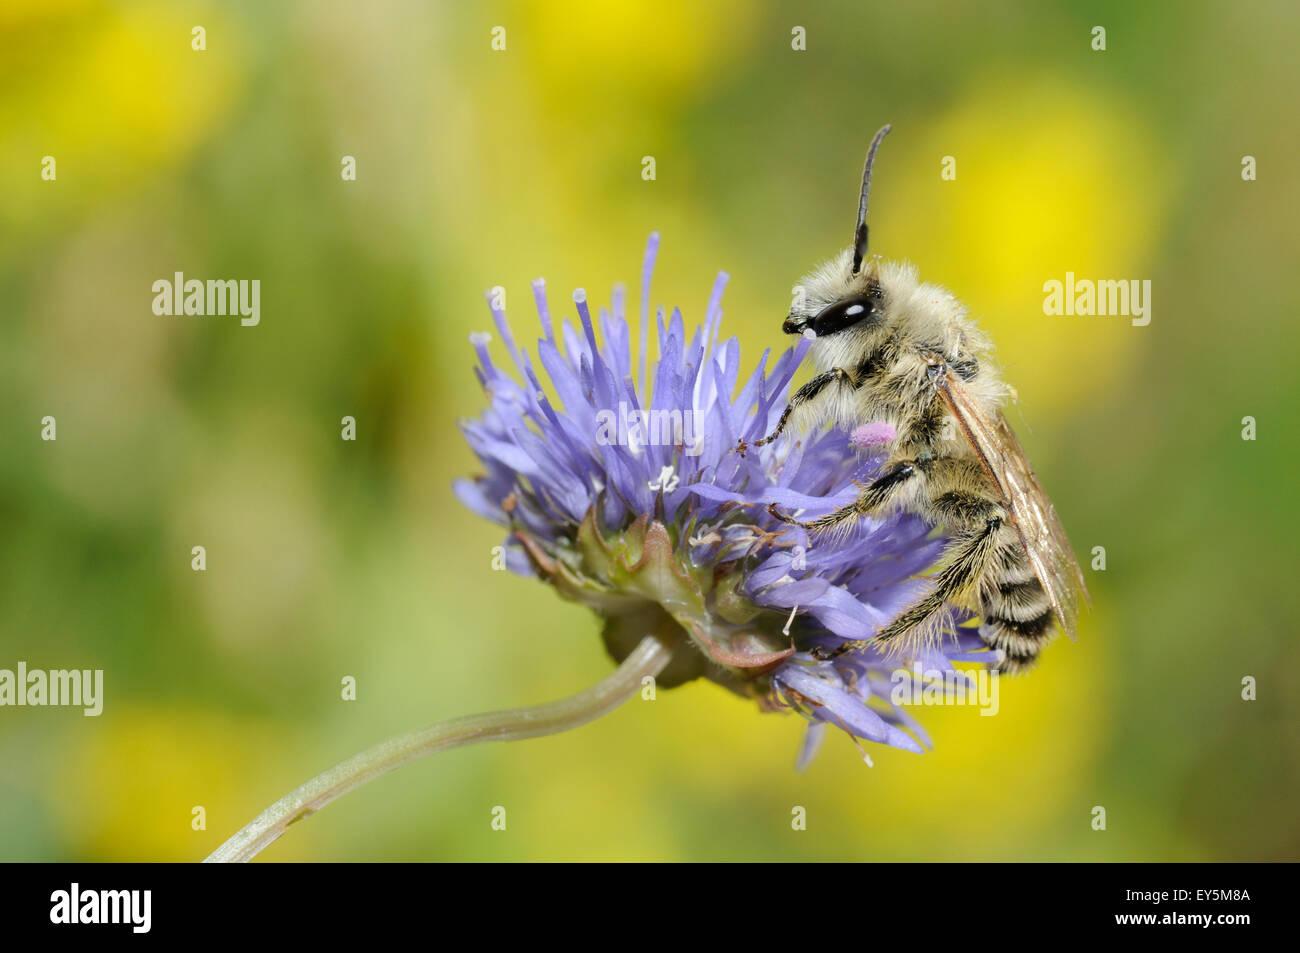 Pantaloon Bee on Sheep's-bit flower - Northern Vosges - Stock Image